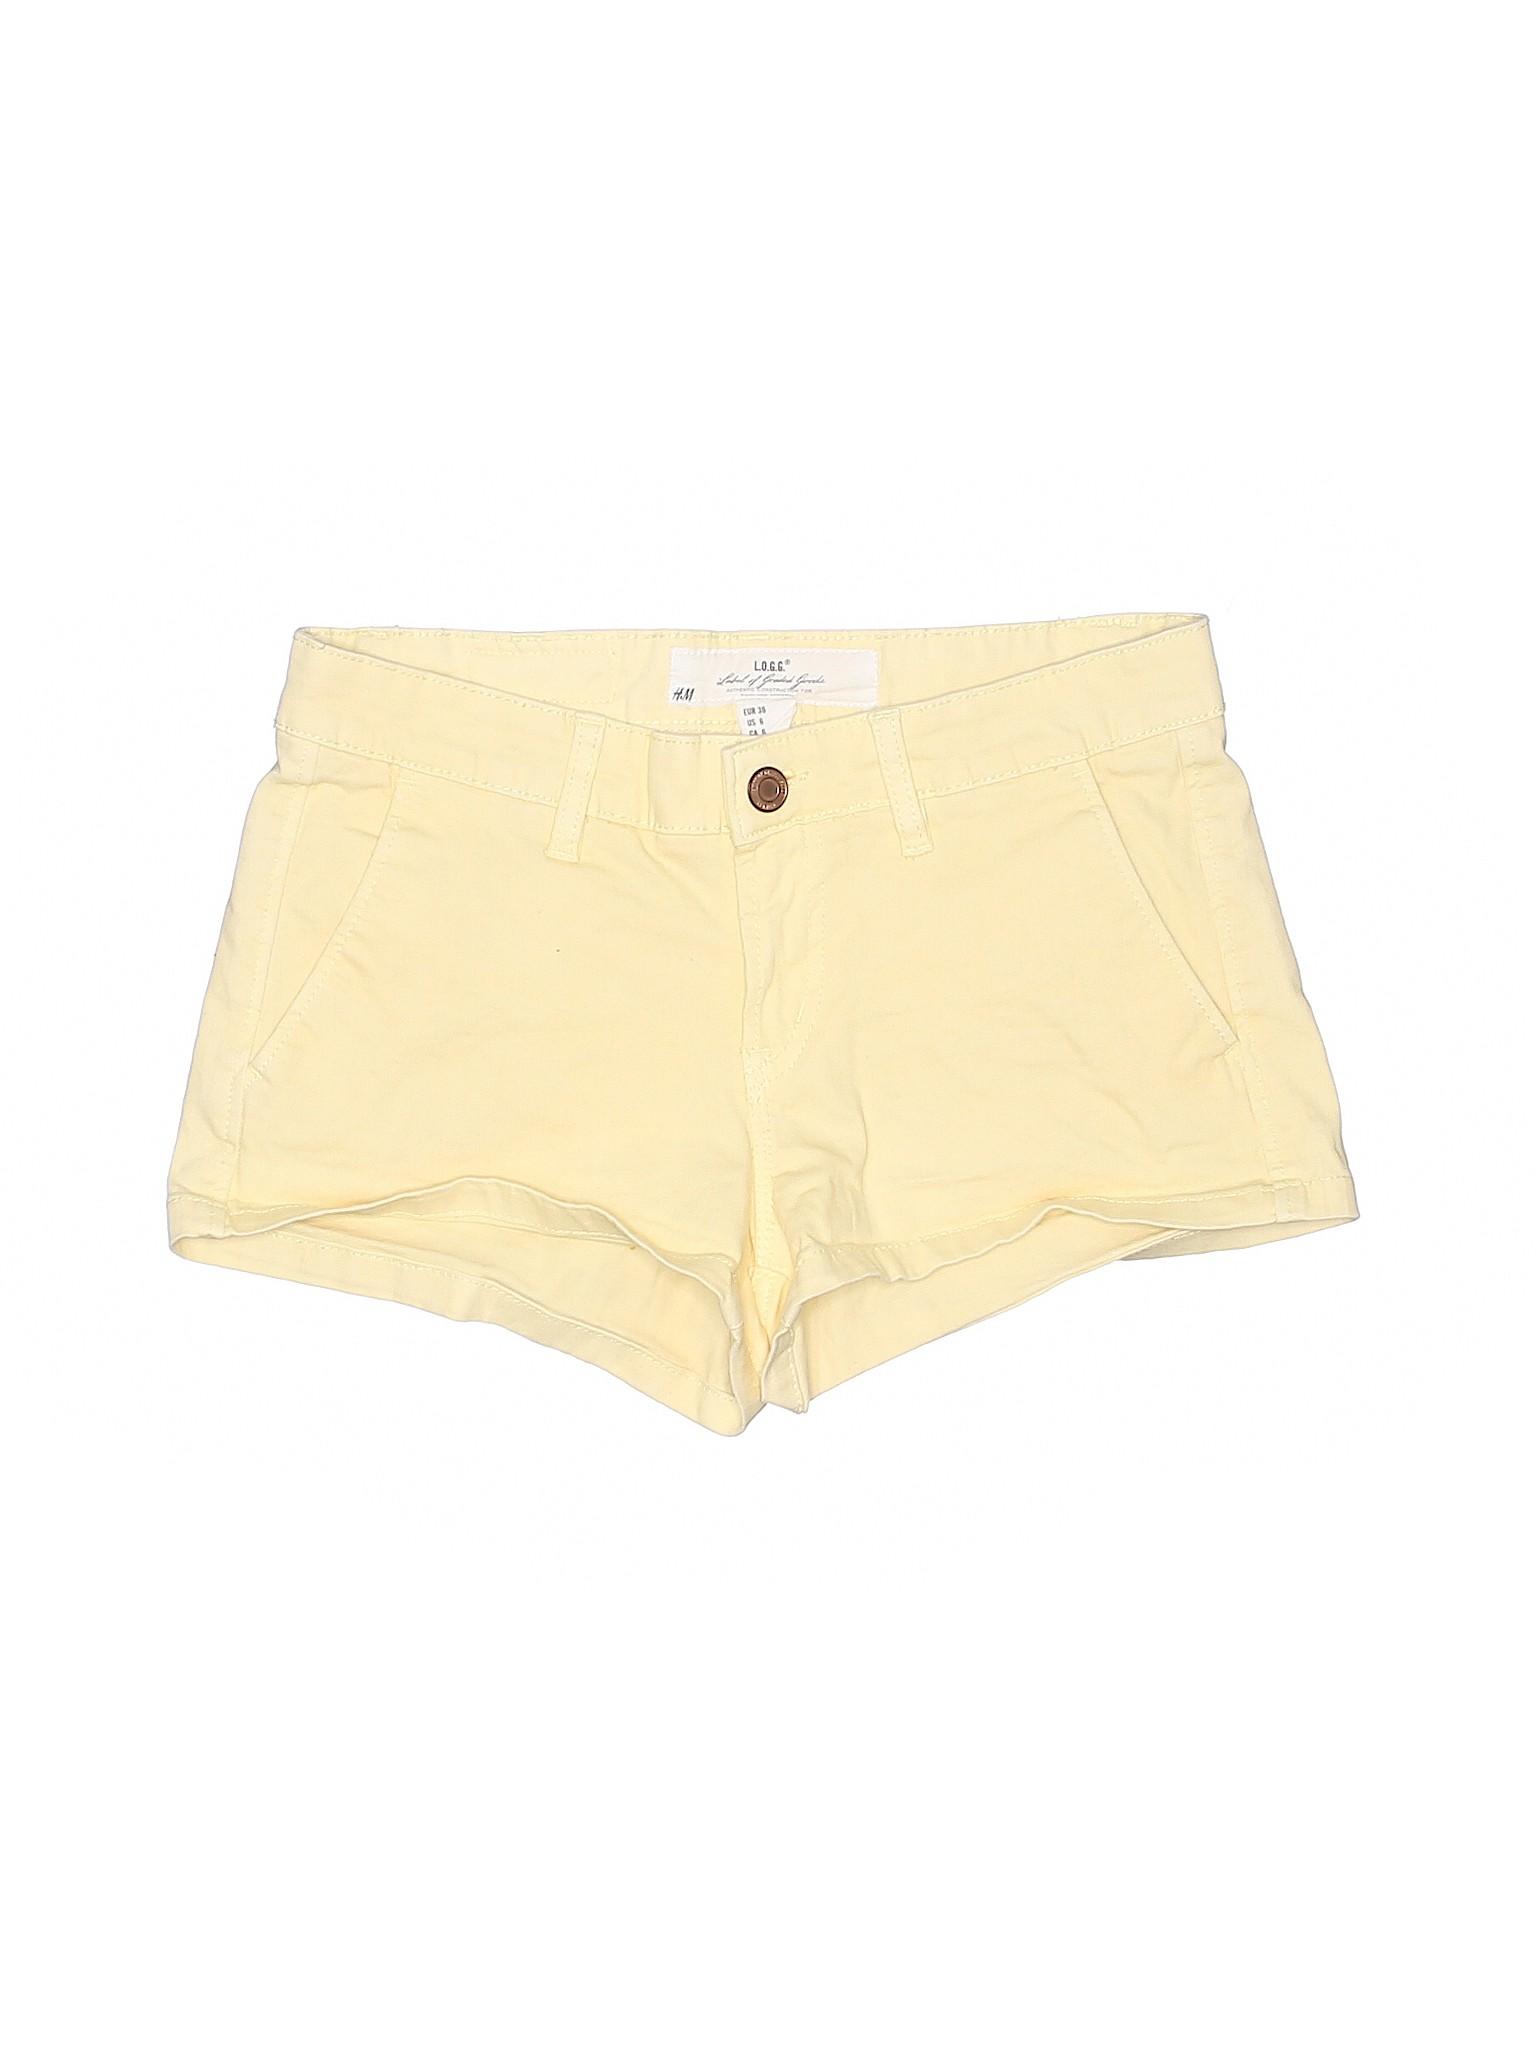 leisure H L Denim O Shorts G G Boutique amp;M Sqd75w1